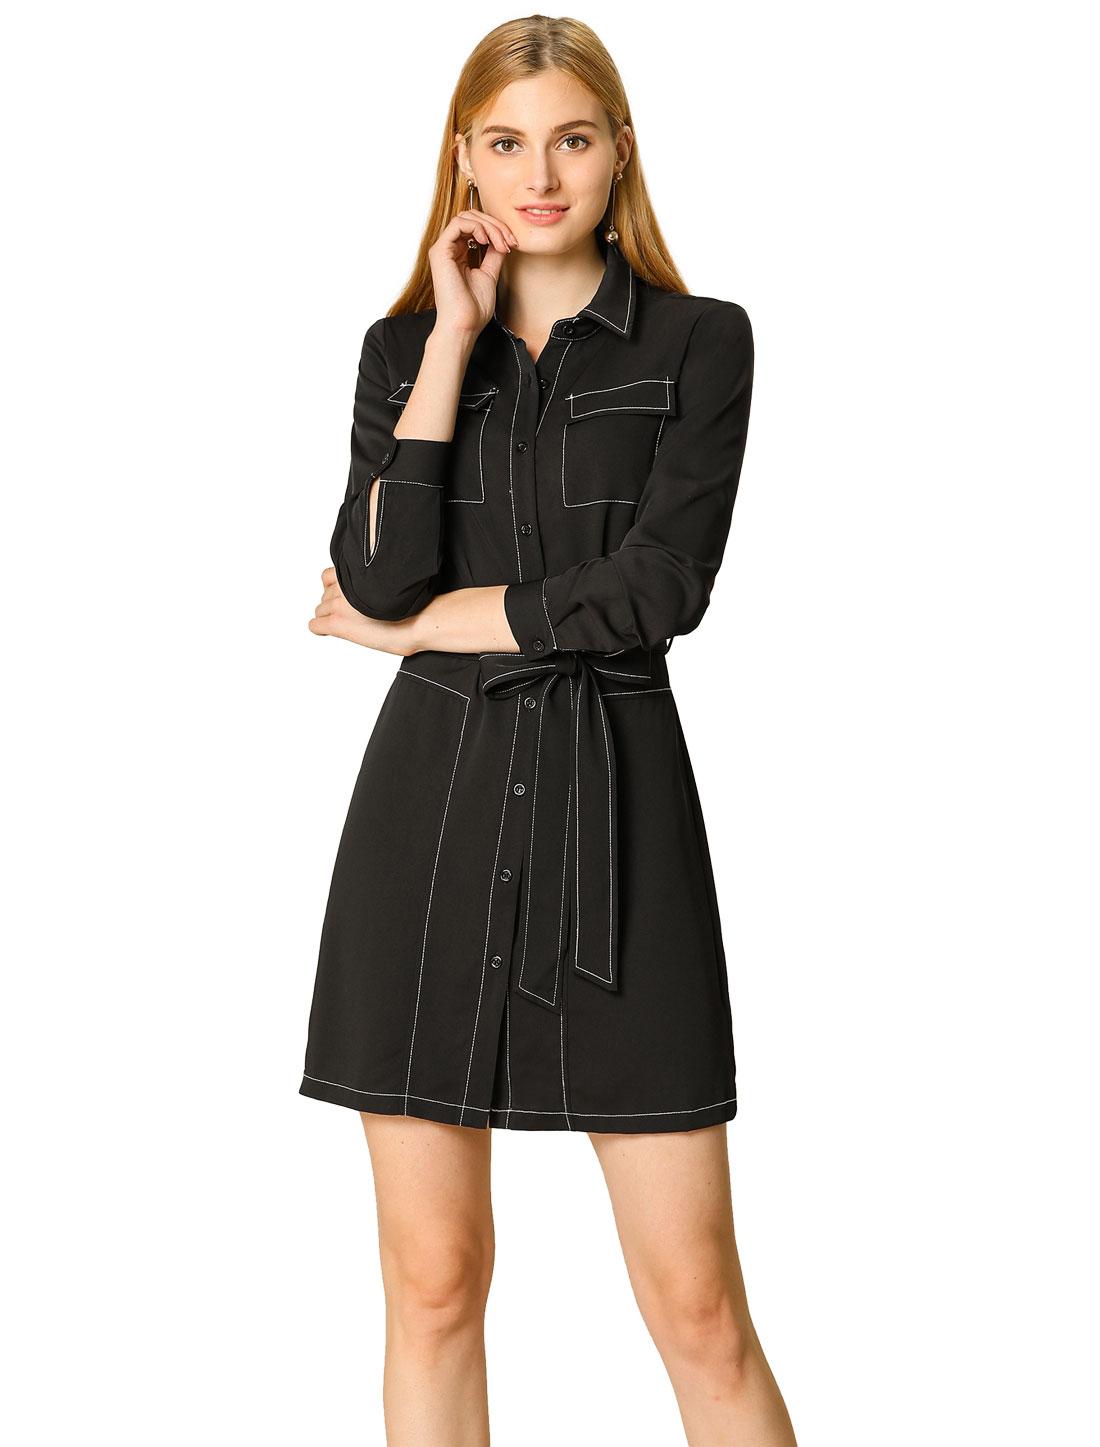 Allegra K Women's Contrast Long Sleeves Belted Waist Dress Black L